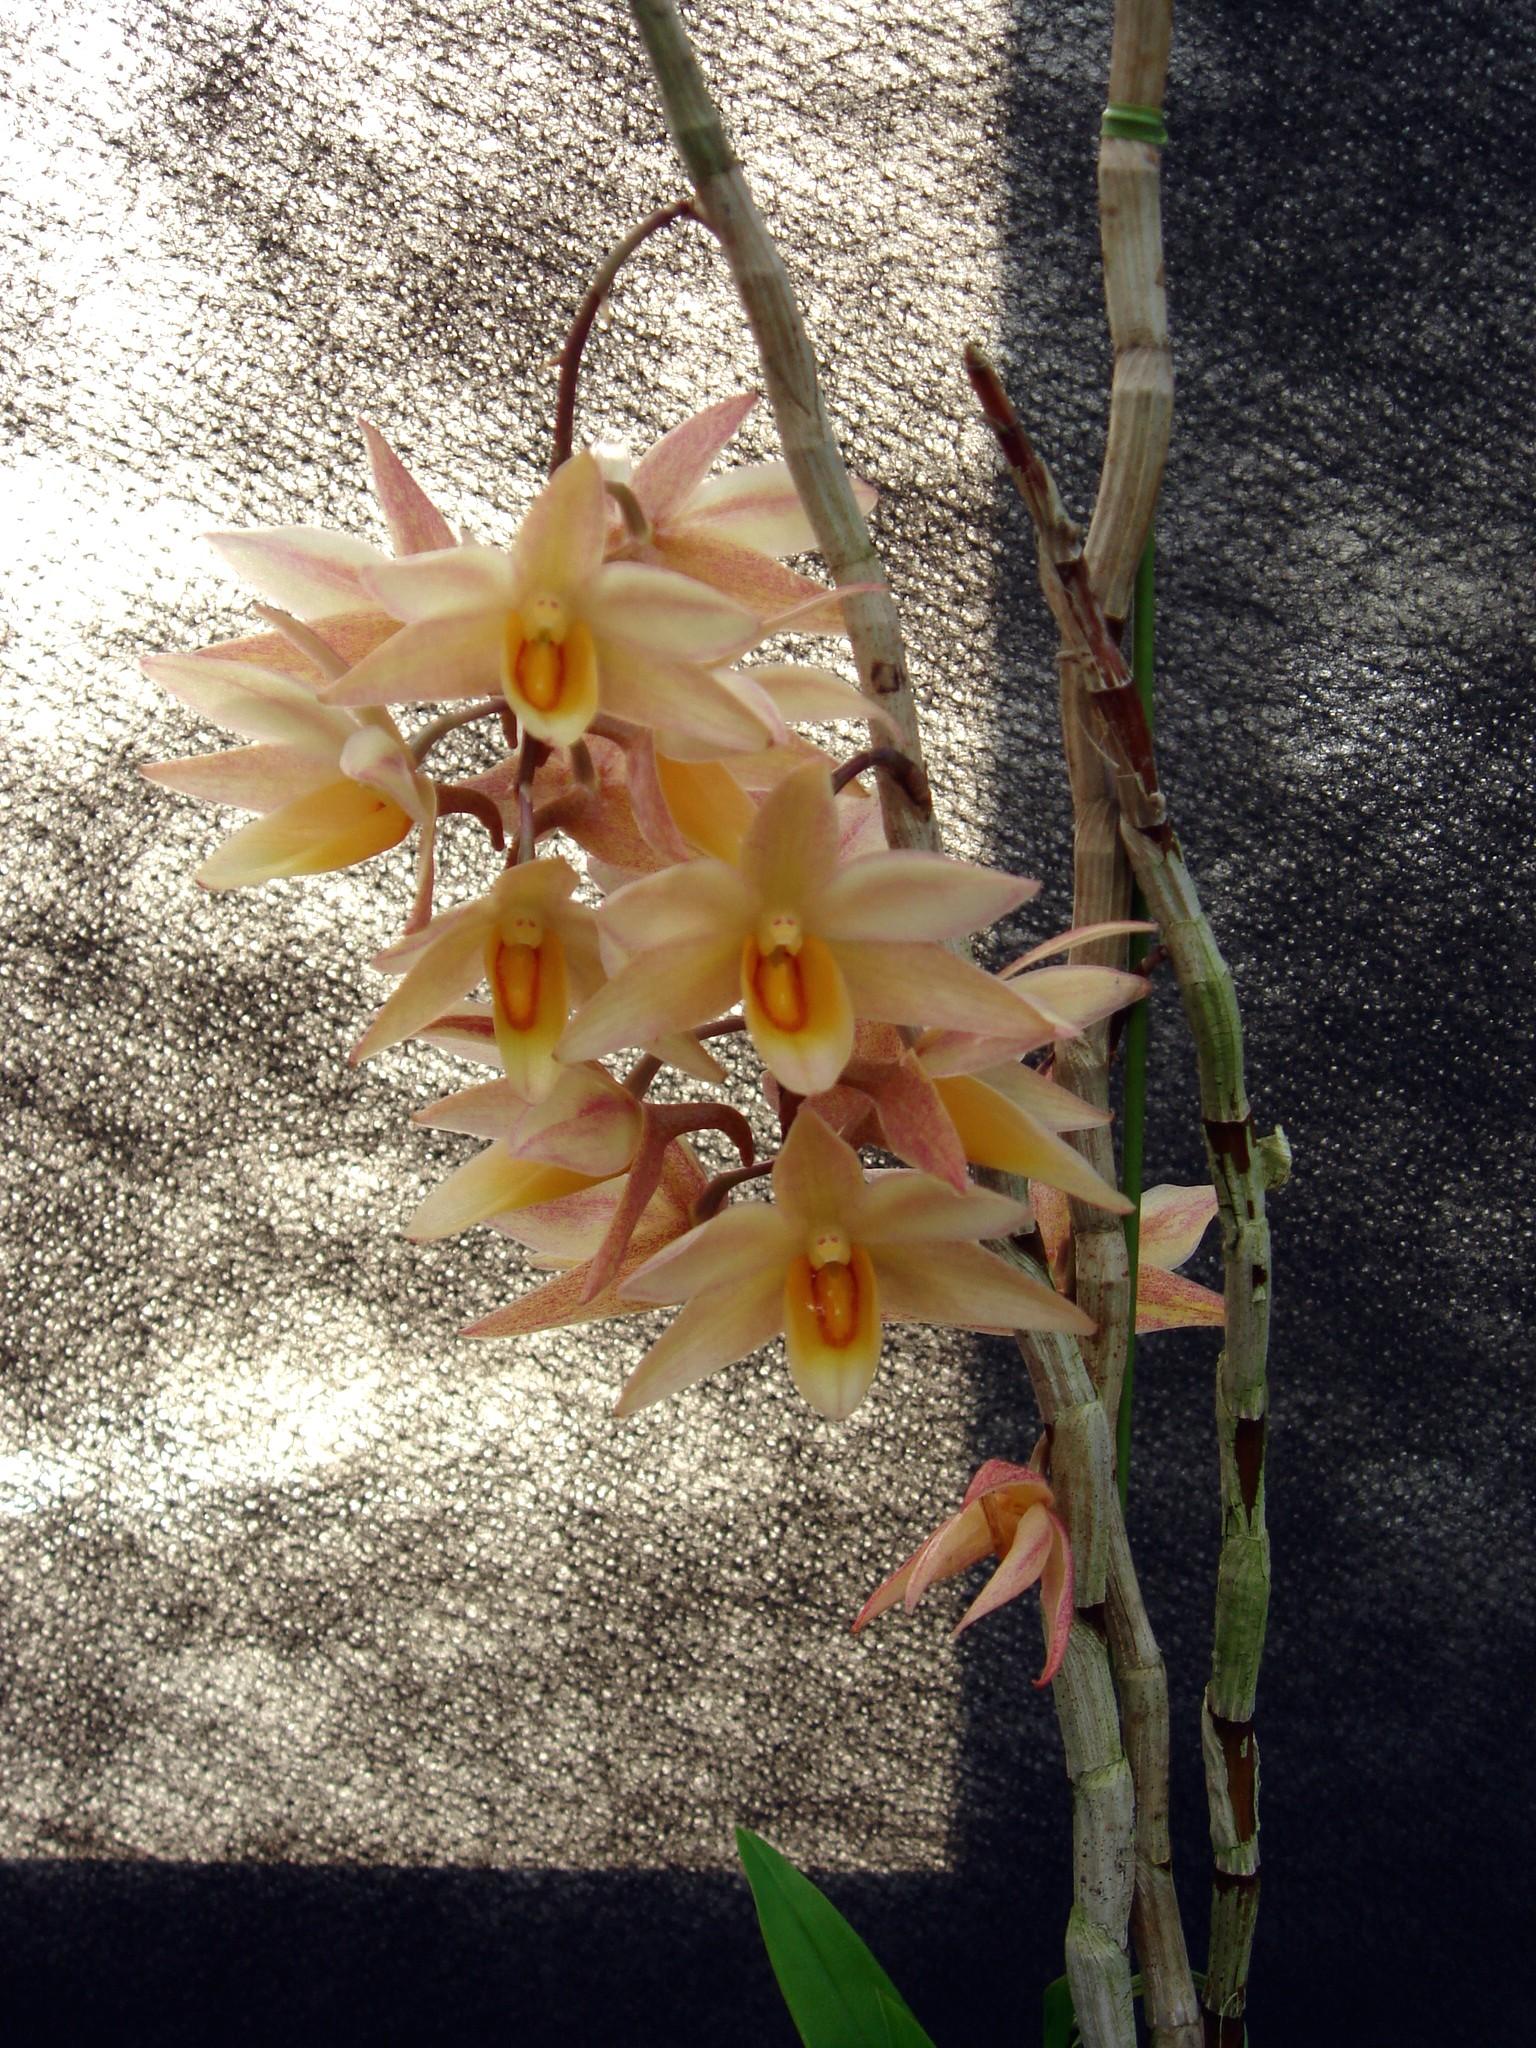 http://orchids.la.coocan.jp/Dendrobium/Dendrobium%20cymboglossum/DSC08889.JPG